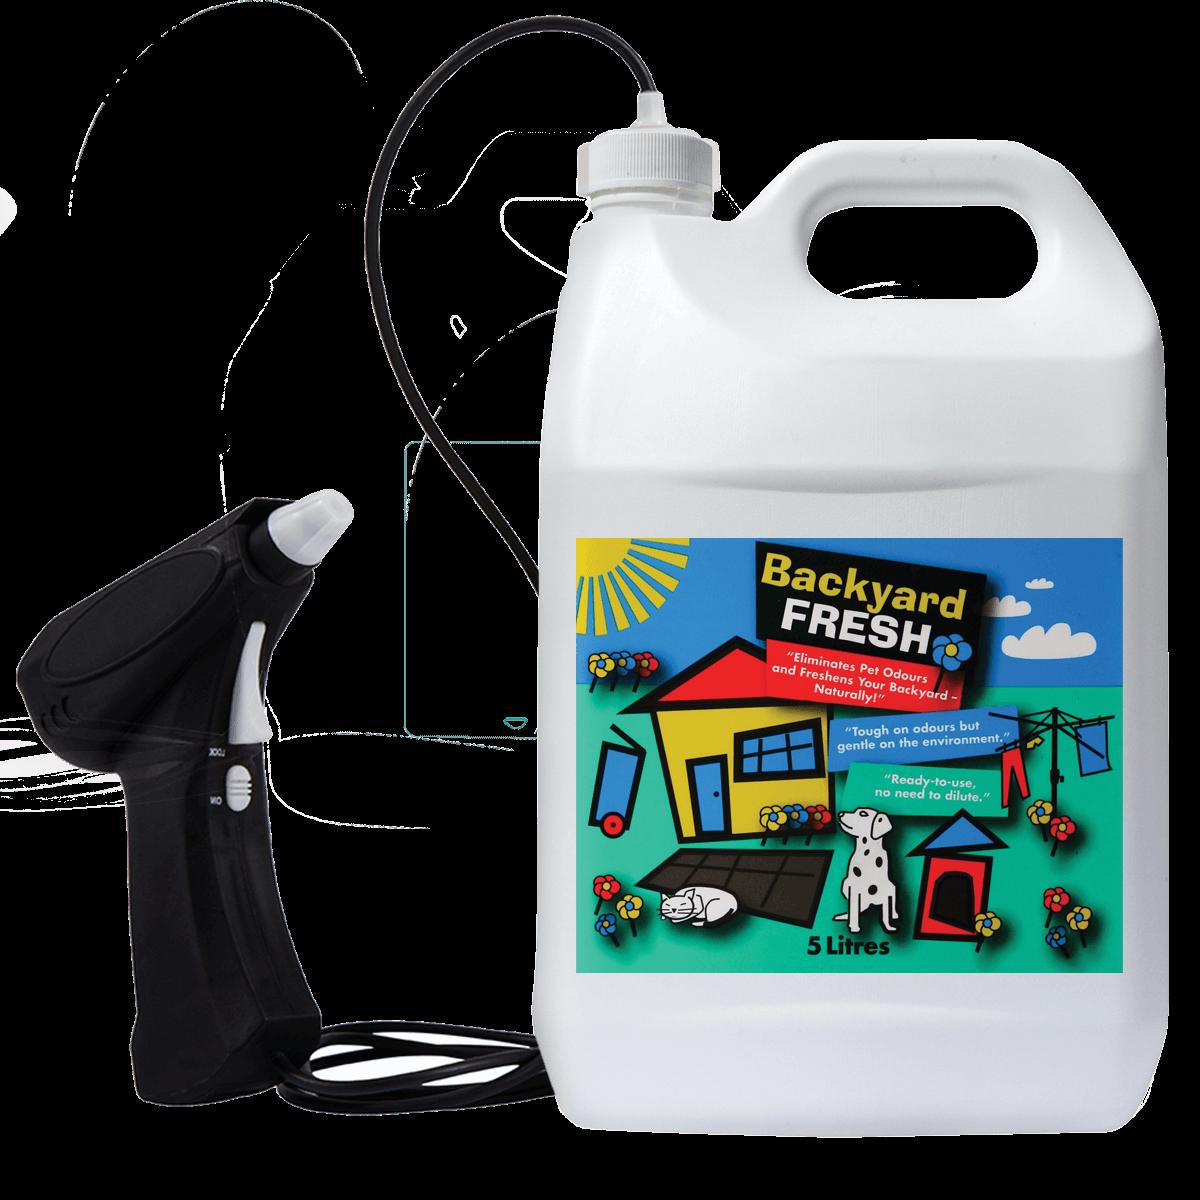 Backyardfresh with sprayer